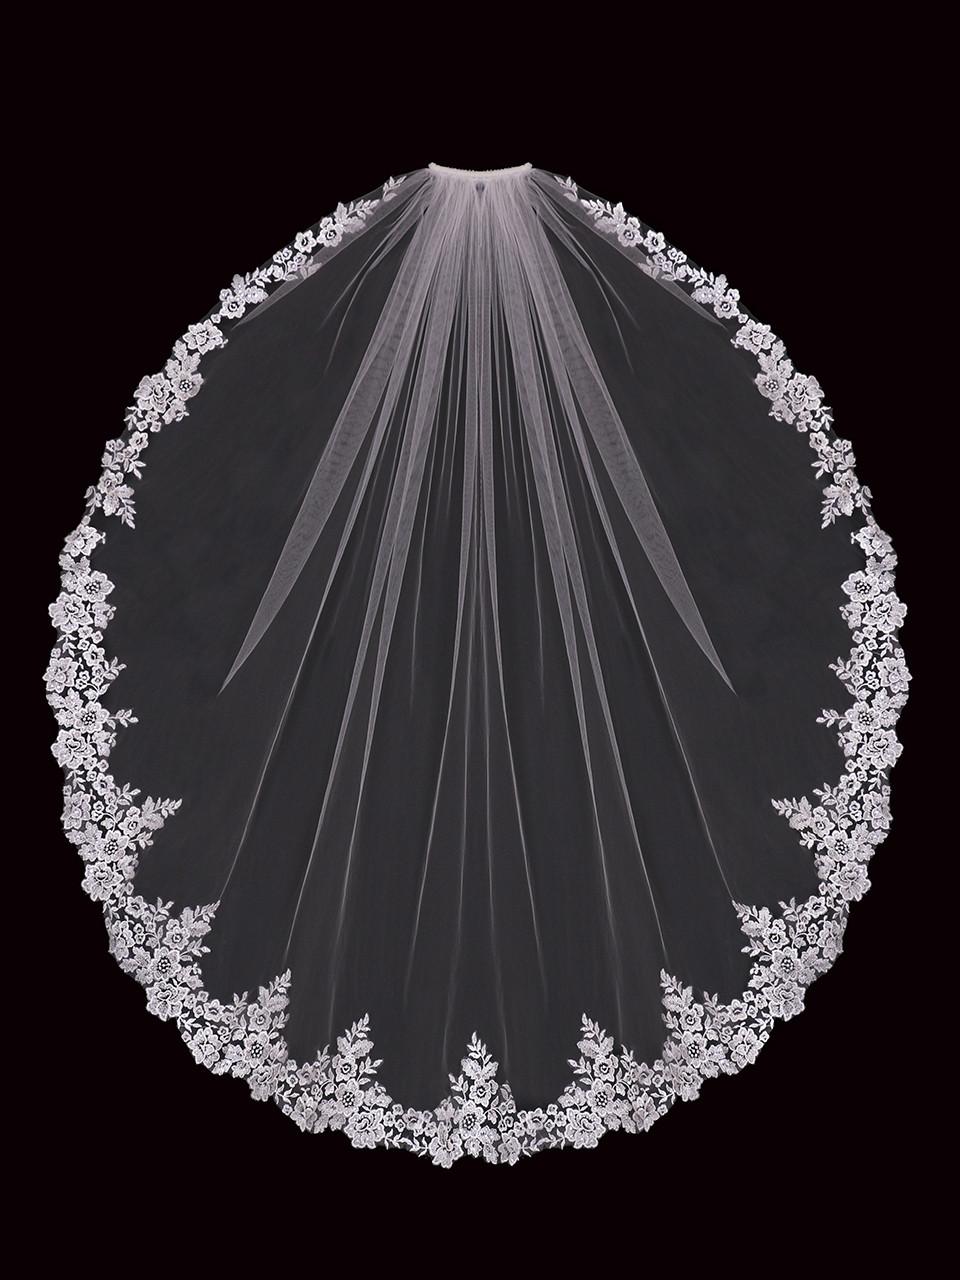 En Vogue Bridal Style V2197SF - English Tulle Fingertip Veil - One Tier